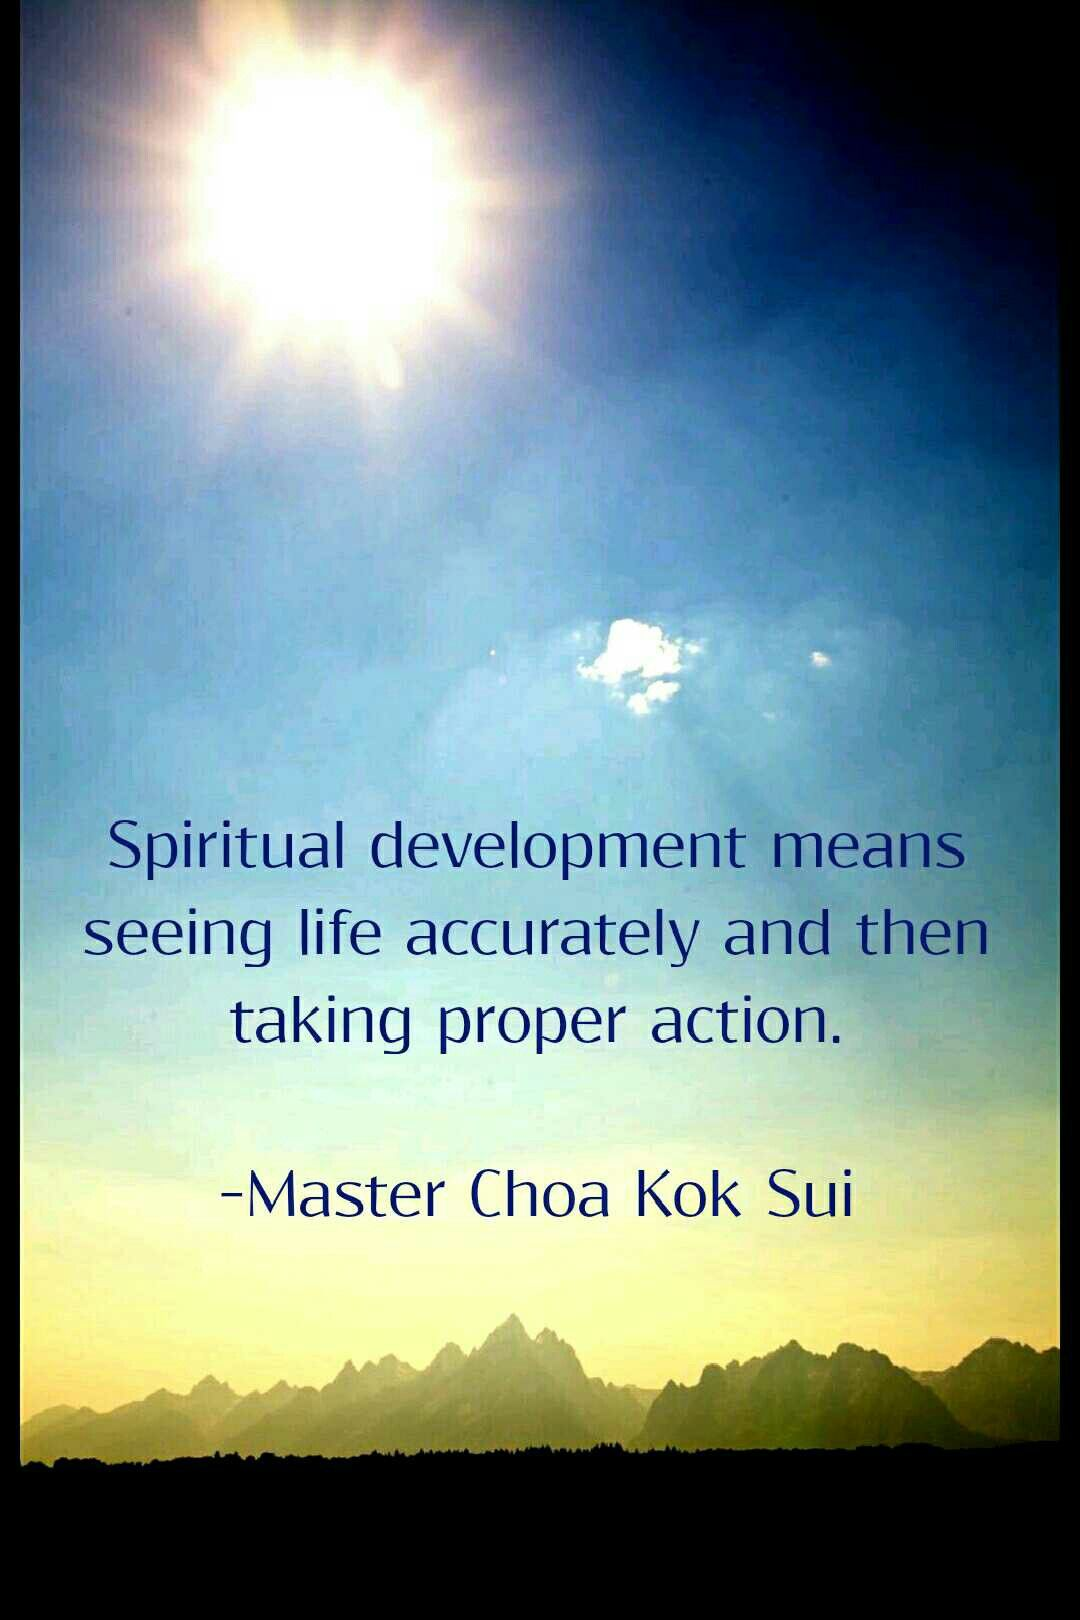 Life Spiritual Quotes Quotes Unfoldapp Mcks Spirituality Development Action Life